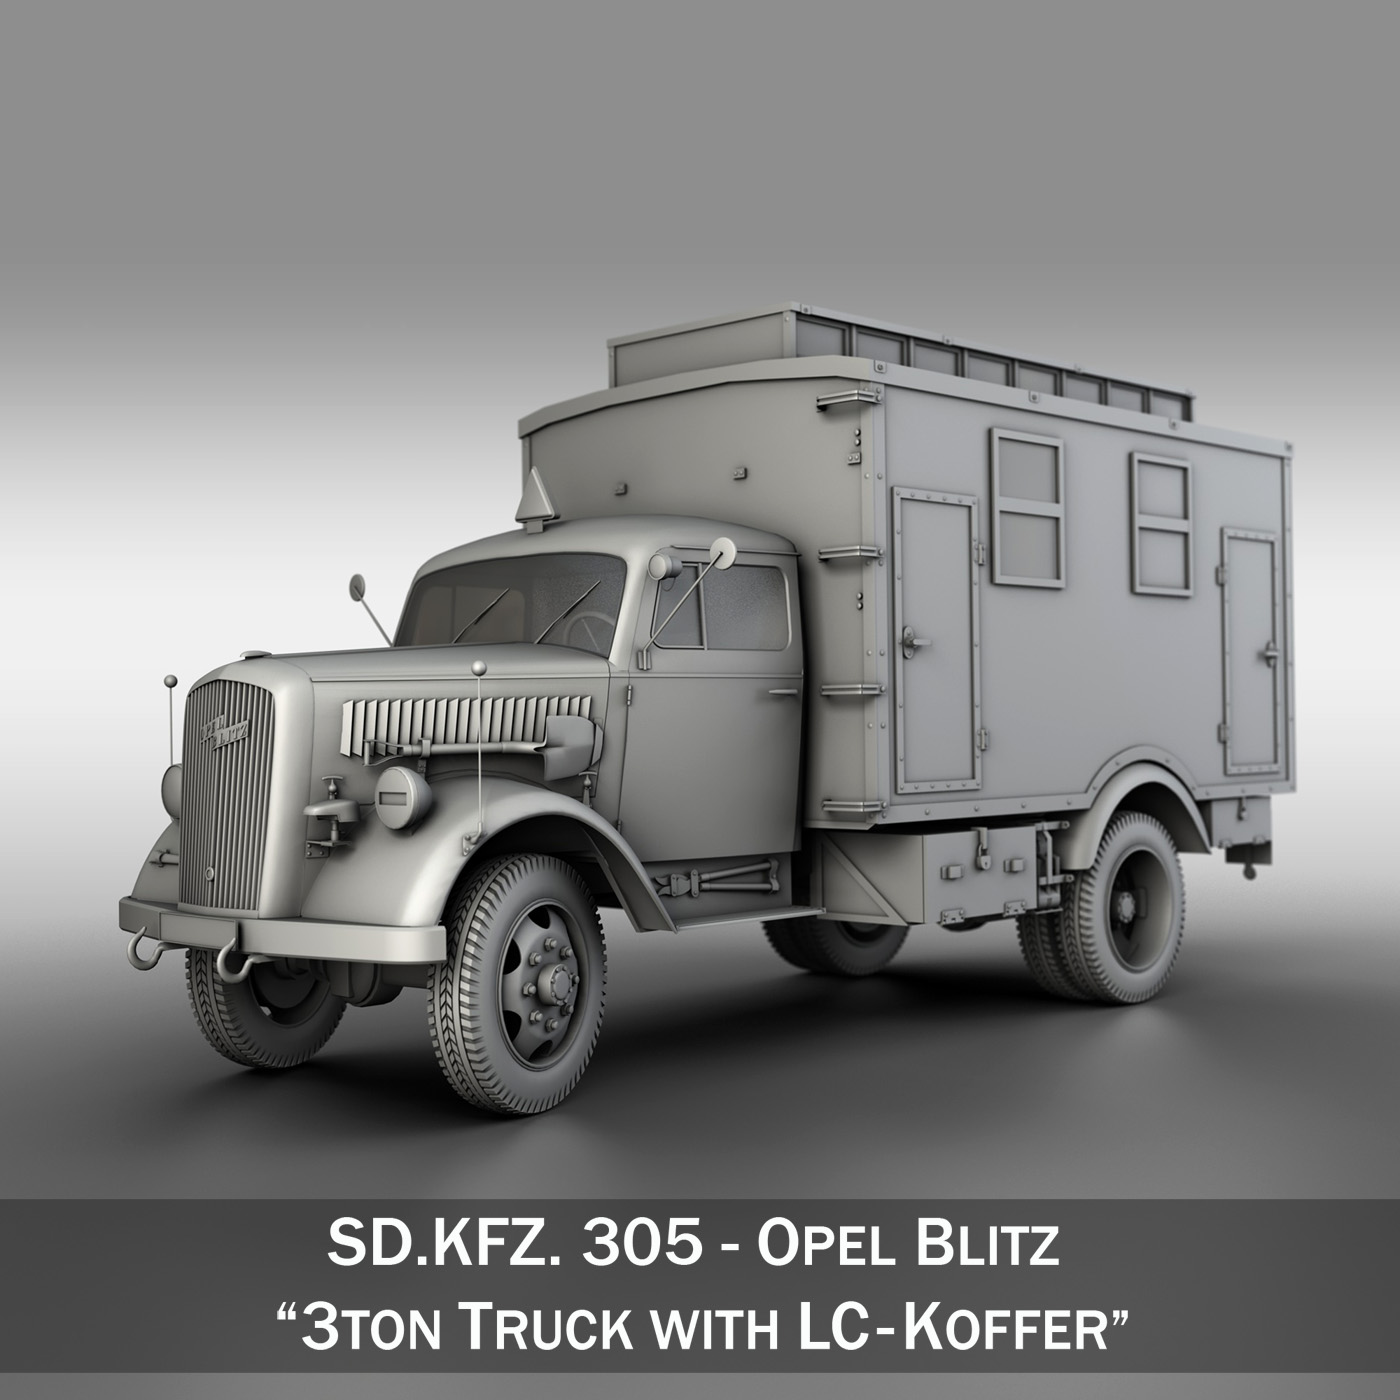 opel blitz – 3t truck with ec koffer 3d model 3ds fbx c4d lwo obj 251575